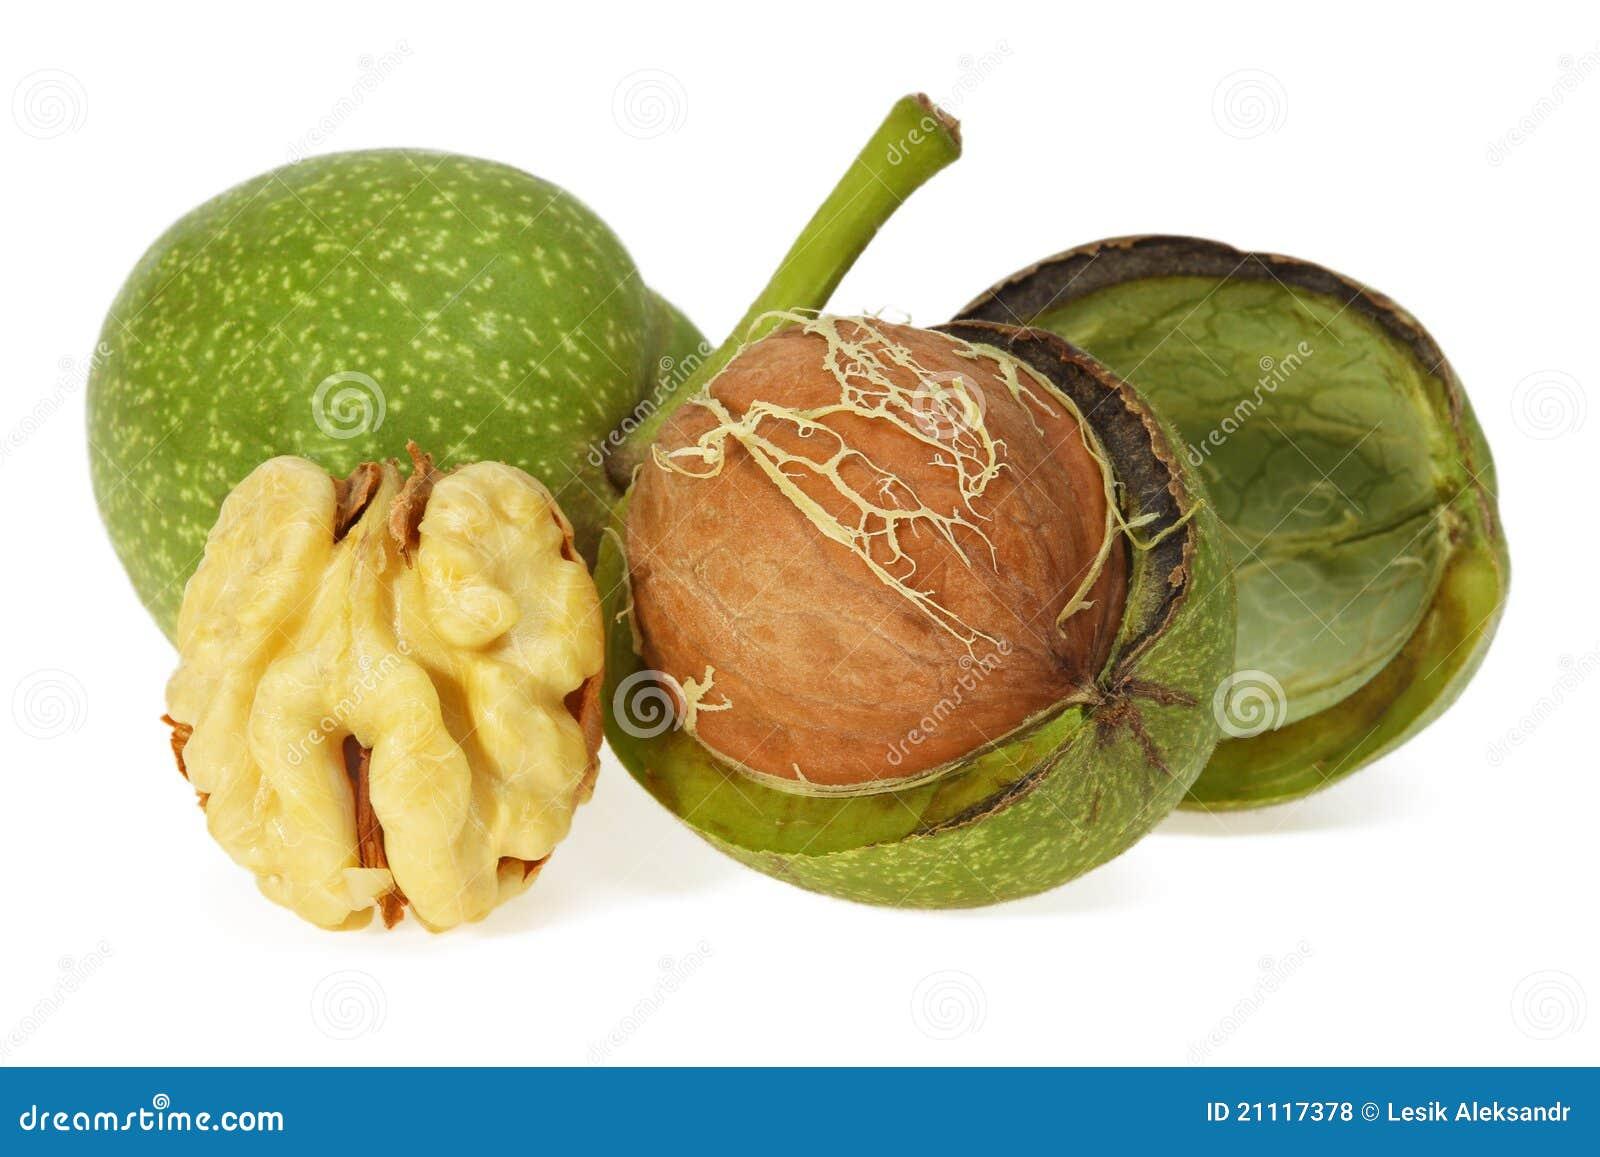 Green walnut peeled and fresh kernel royalty free stock photos